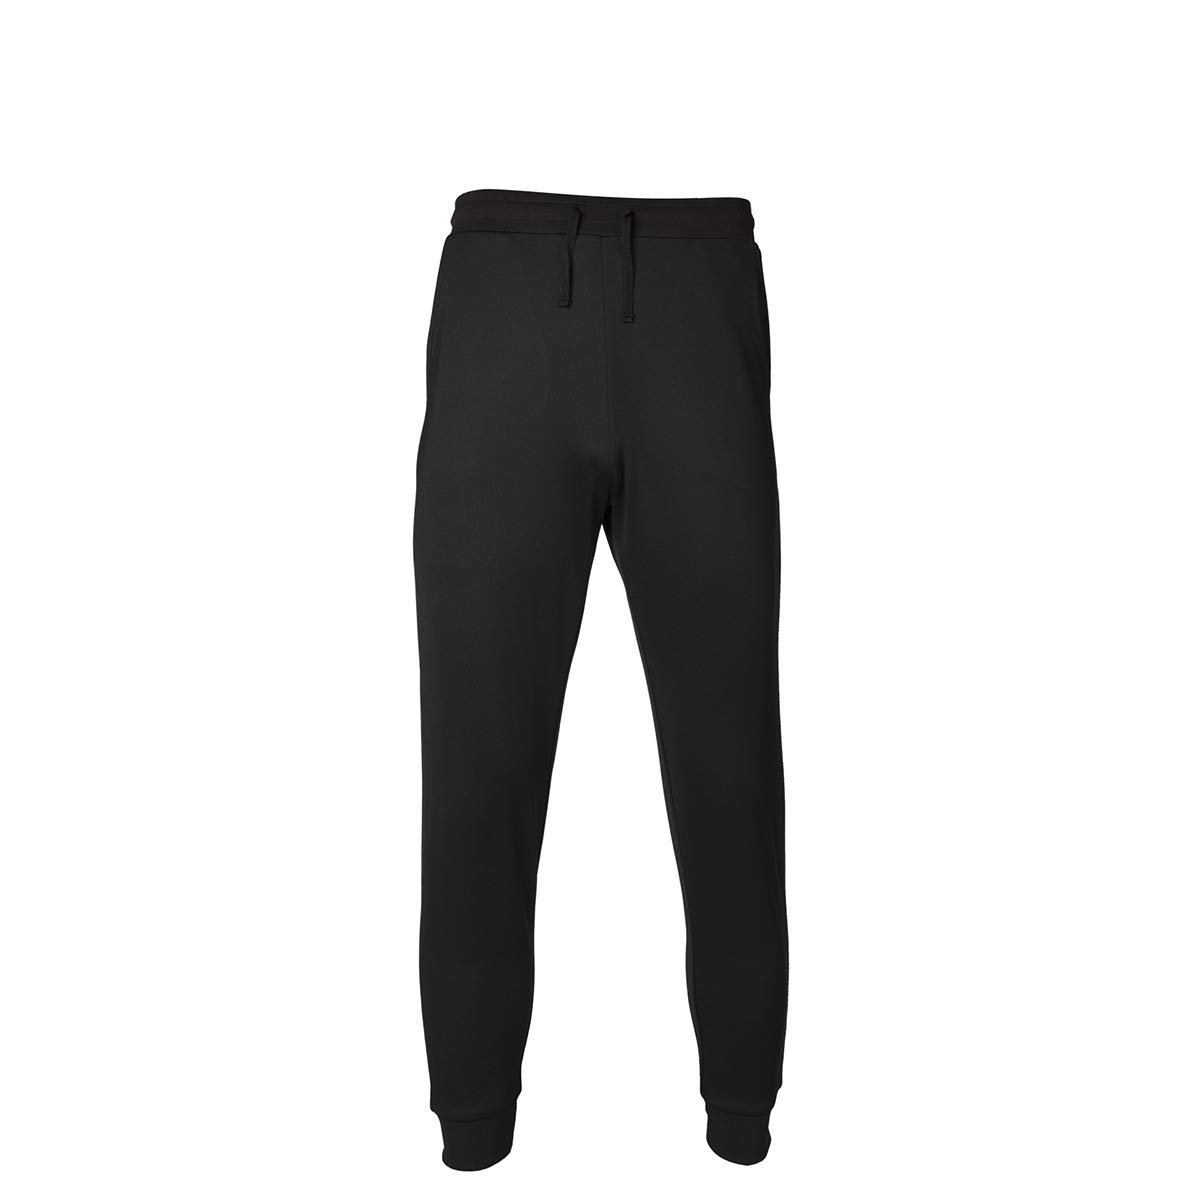 509 Stroma Fleece Pant Black - Small